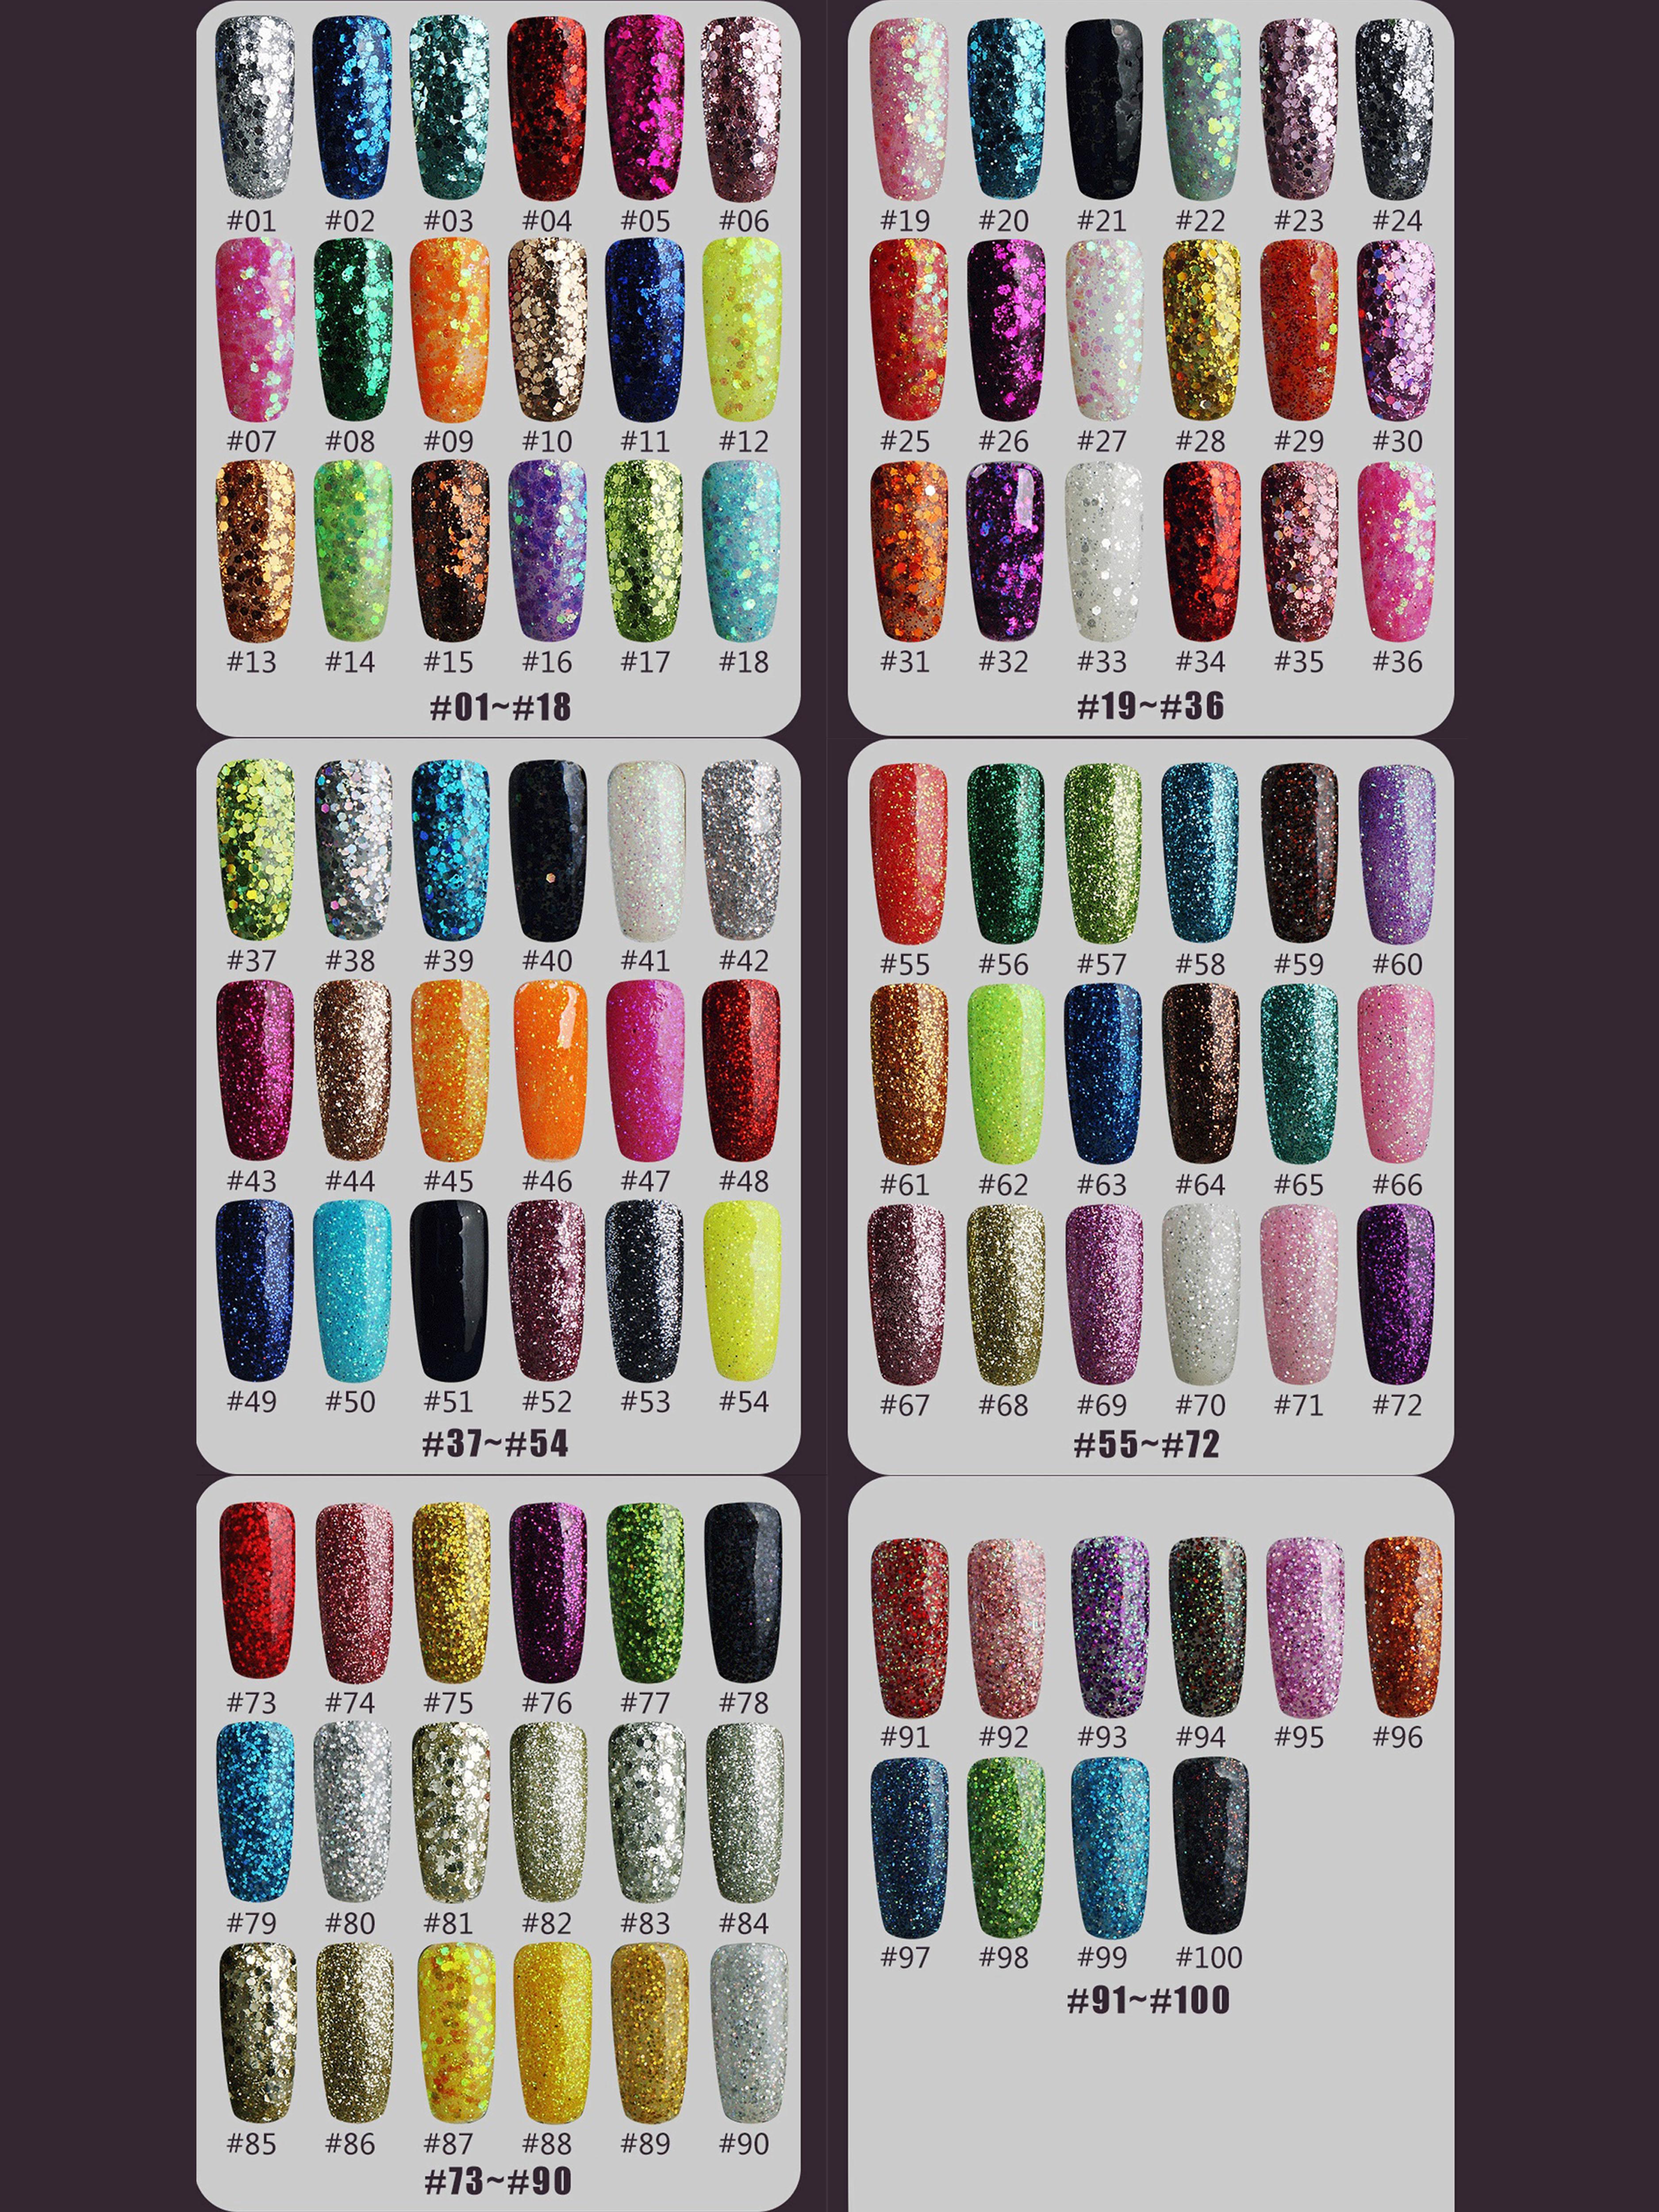 8ml nail glitter Sequins powder uv gel polish hybrid semi permanent soak off led nail gel varnish long lasting nail Lacquer 5